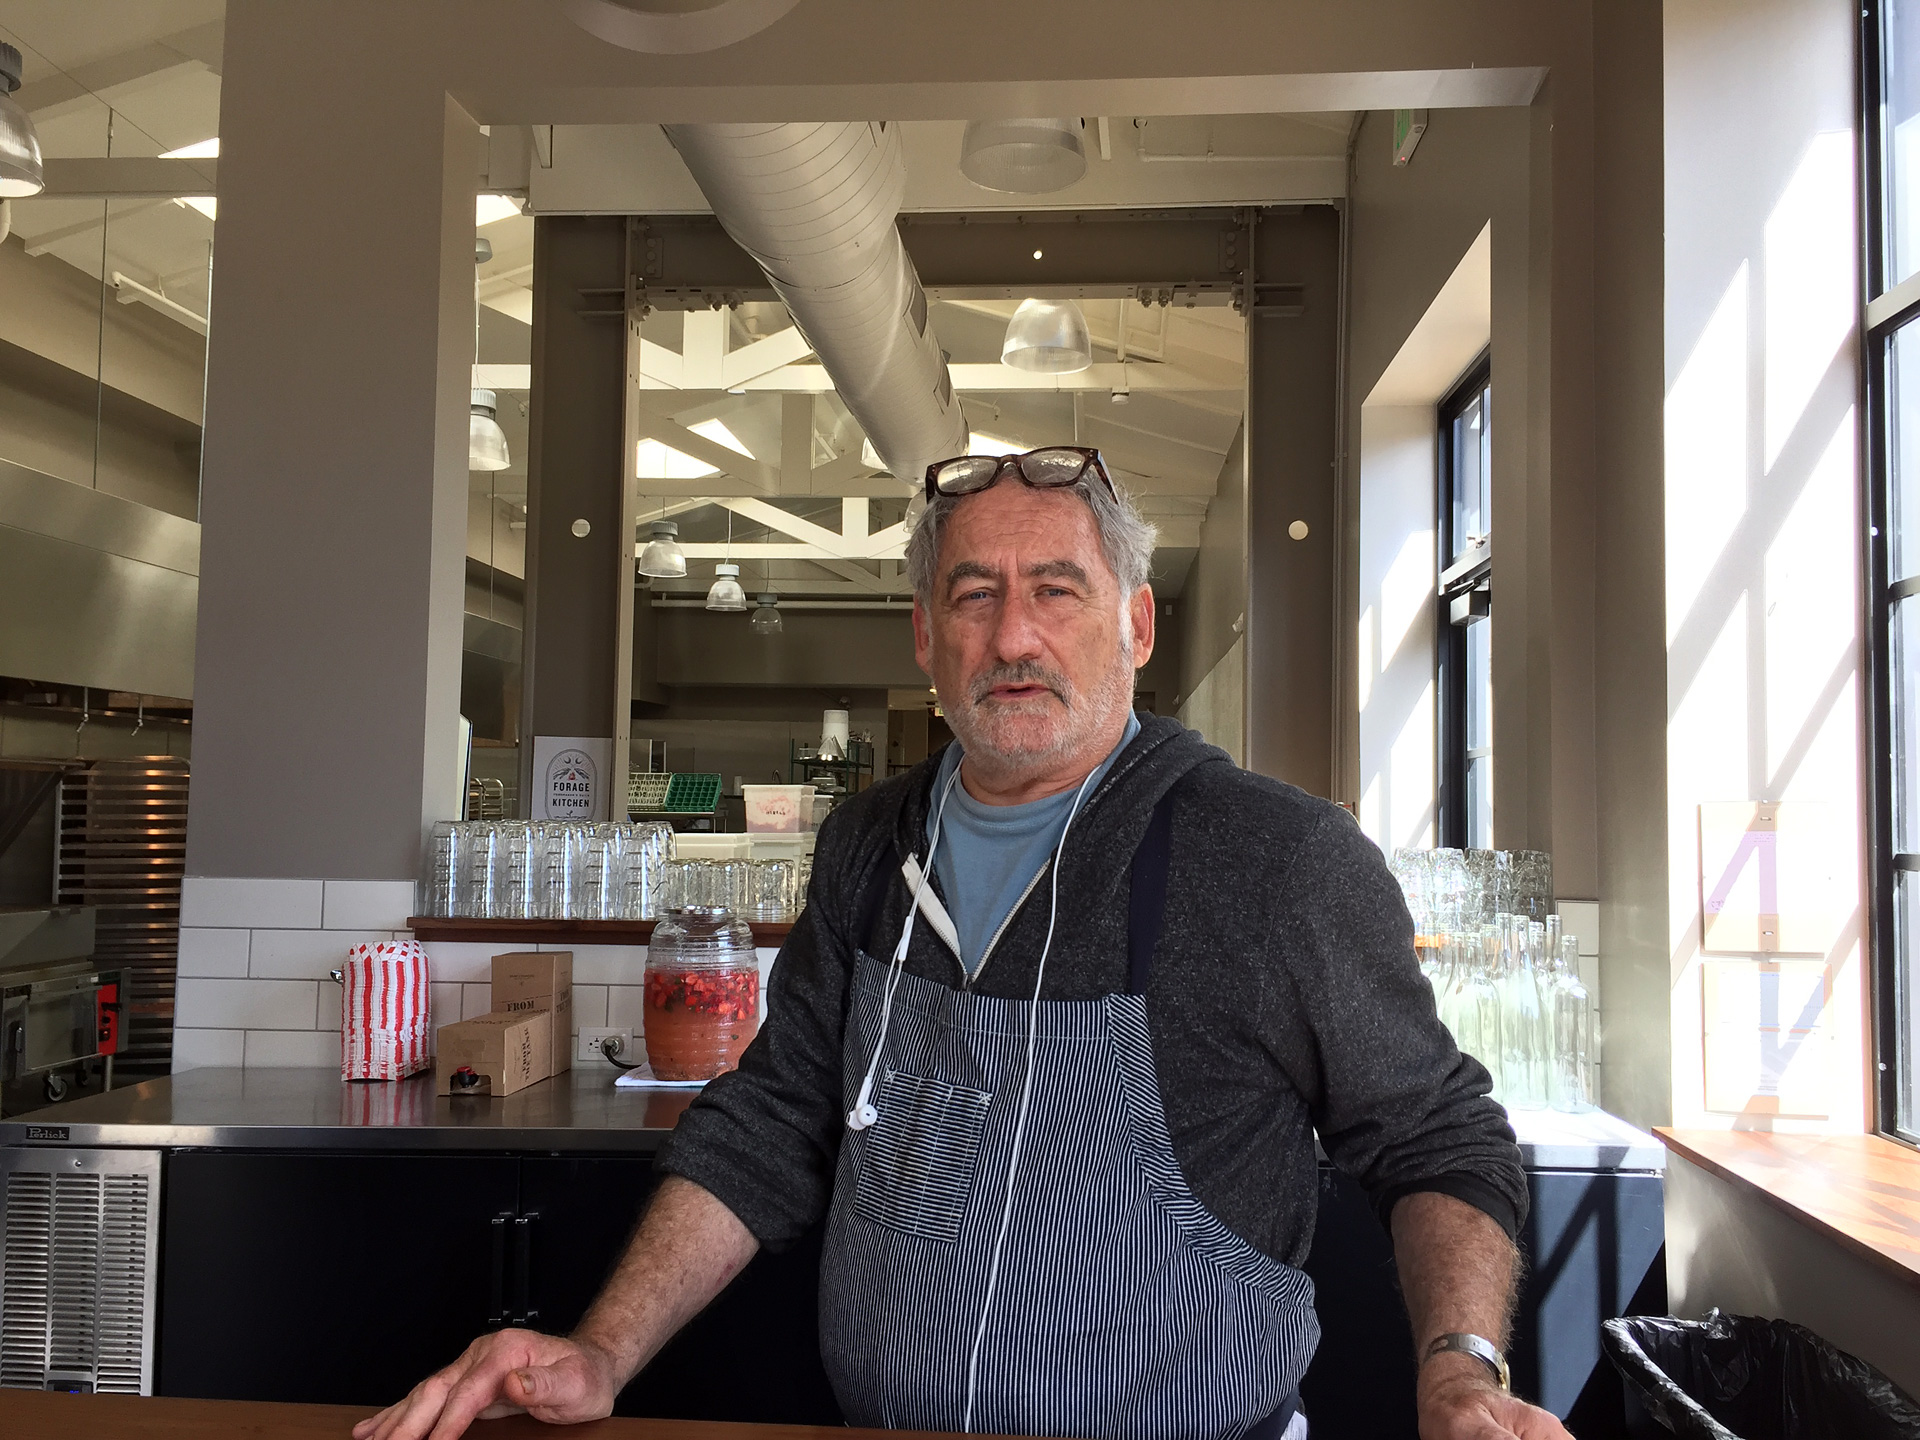 Jeff Mason, sandwich mastermind at Pal's Kitchen